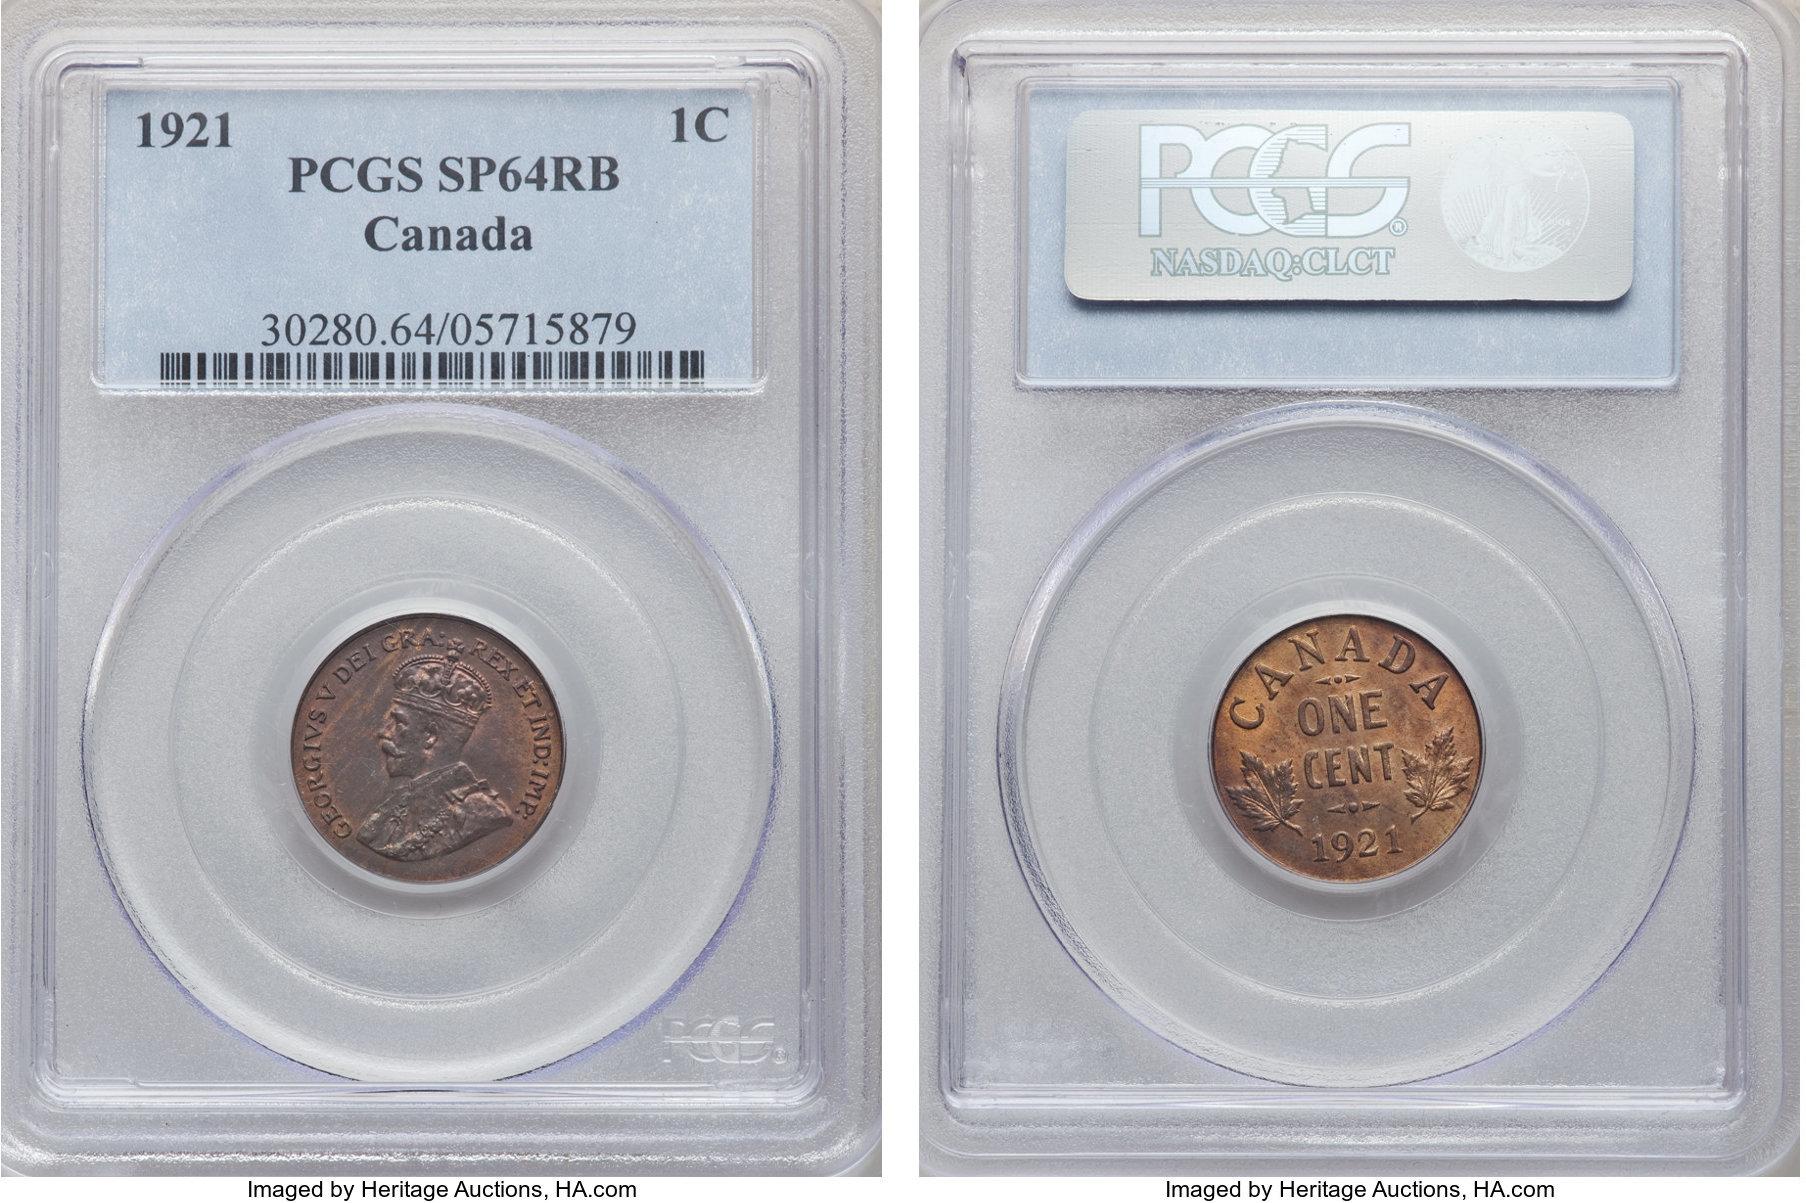 Canada 1977 Queen Elizabeth II/'s Accession Gem Specimen Silver Dollar!!